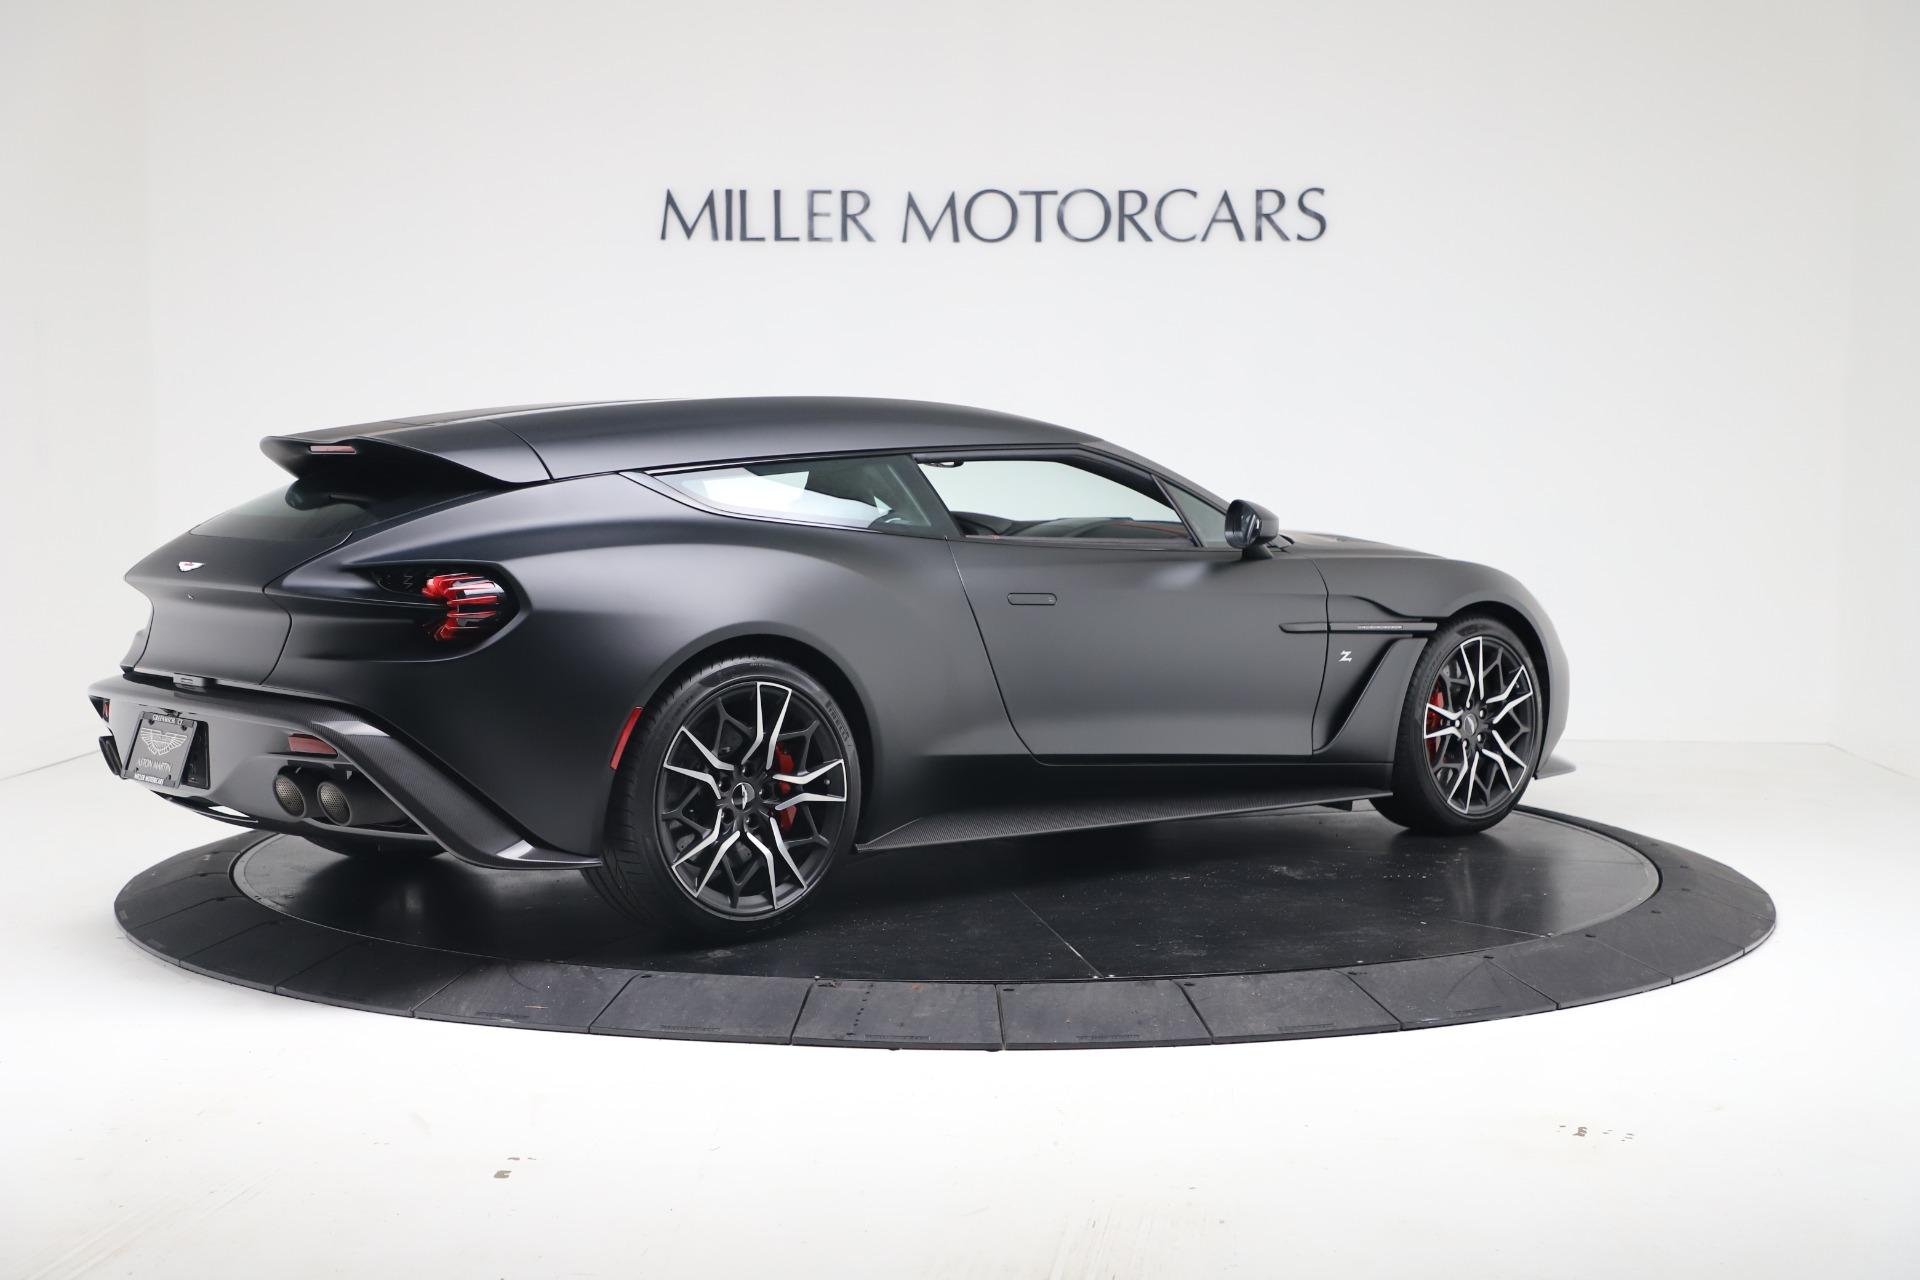 New 2019 Aston Martin Vanquish Shooting Brake For Sale In Westport, CT 3512_p8